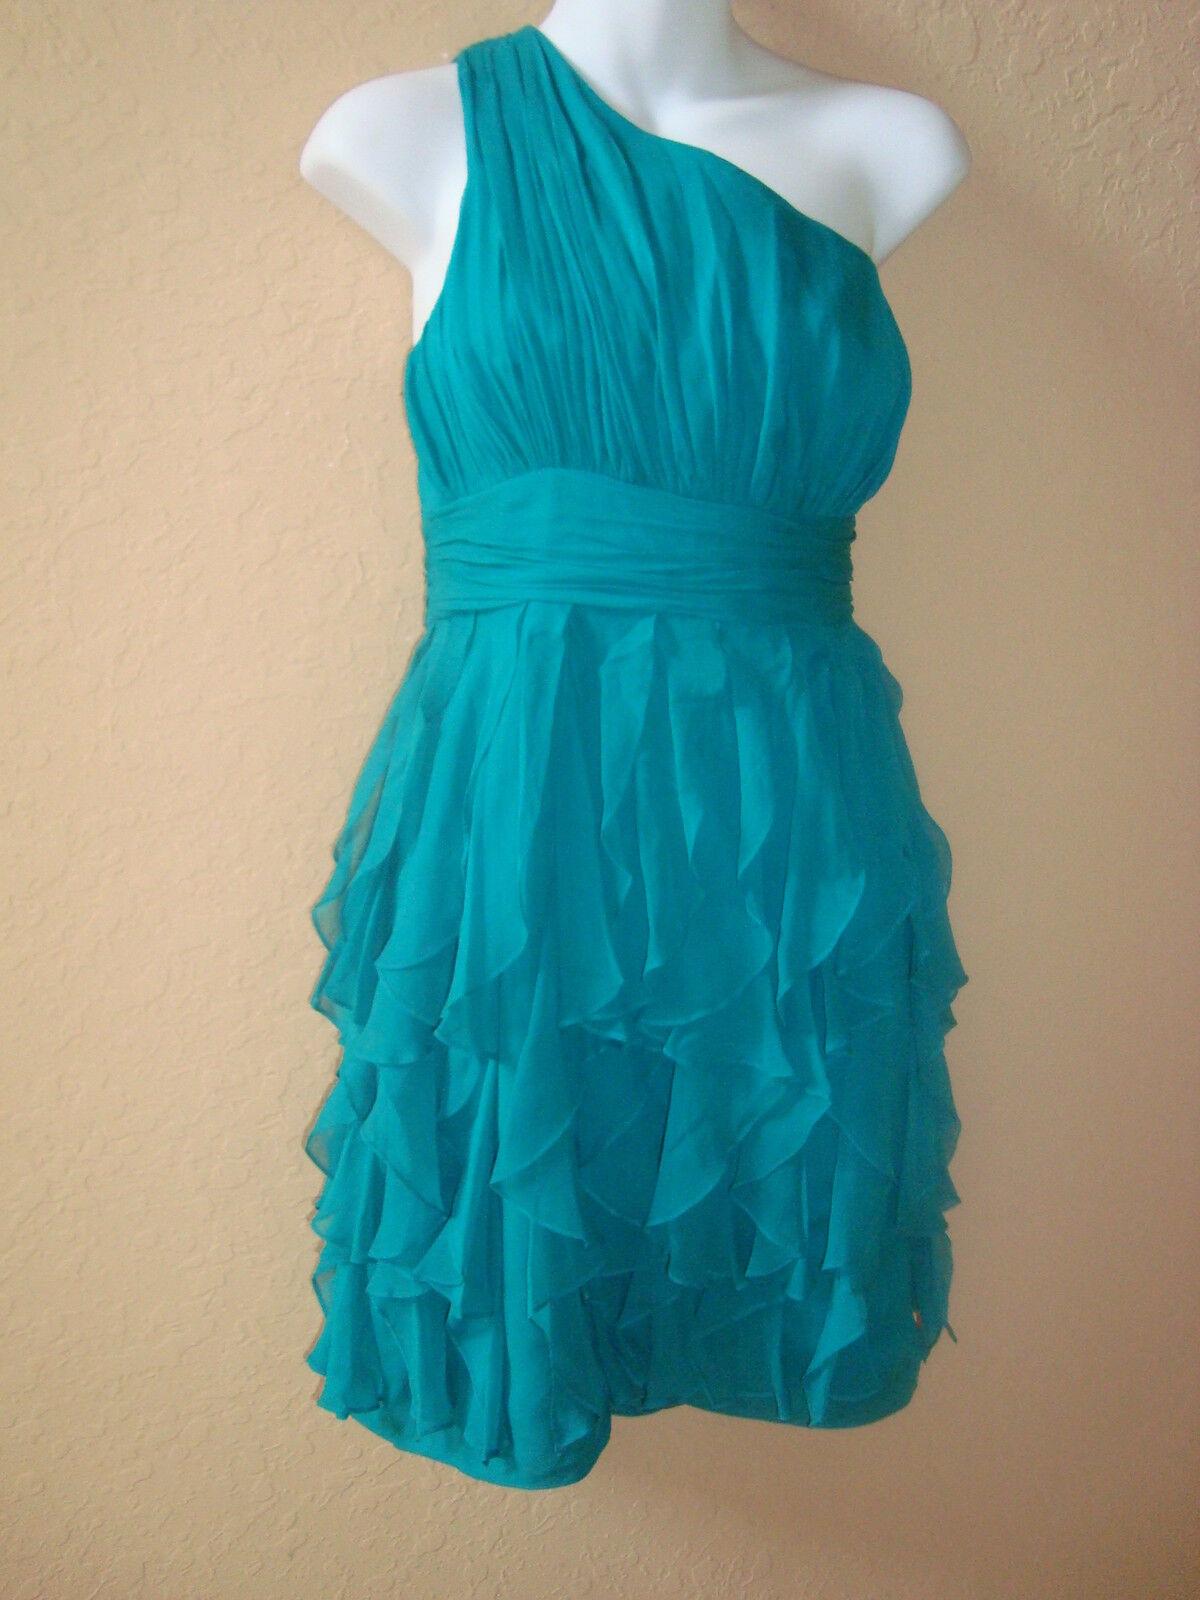 New Display Model TIBI Womens Teal Green One Shoulder Ruffle Silk Dress 6